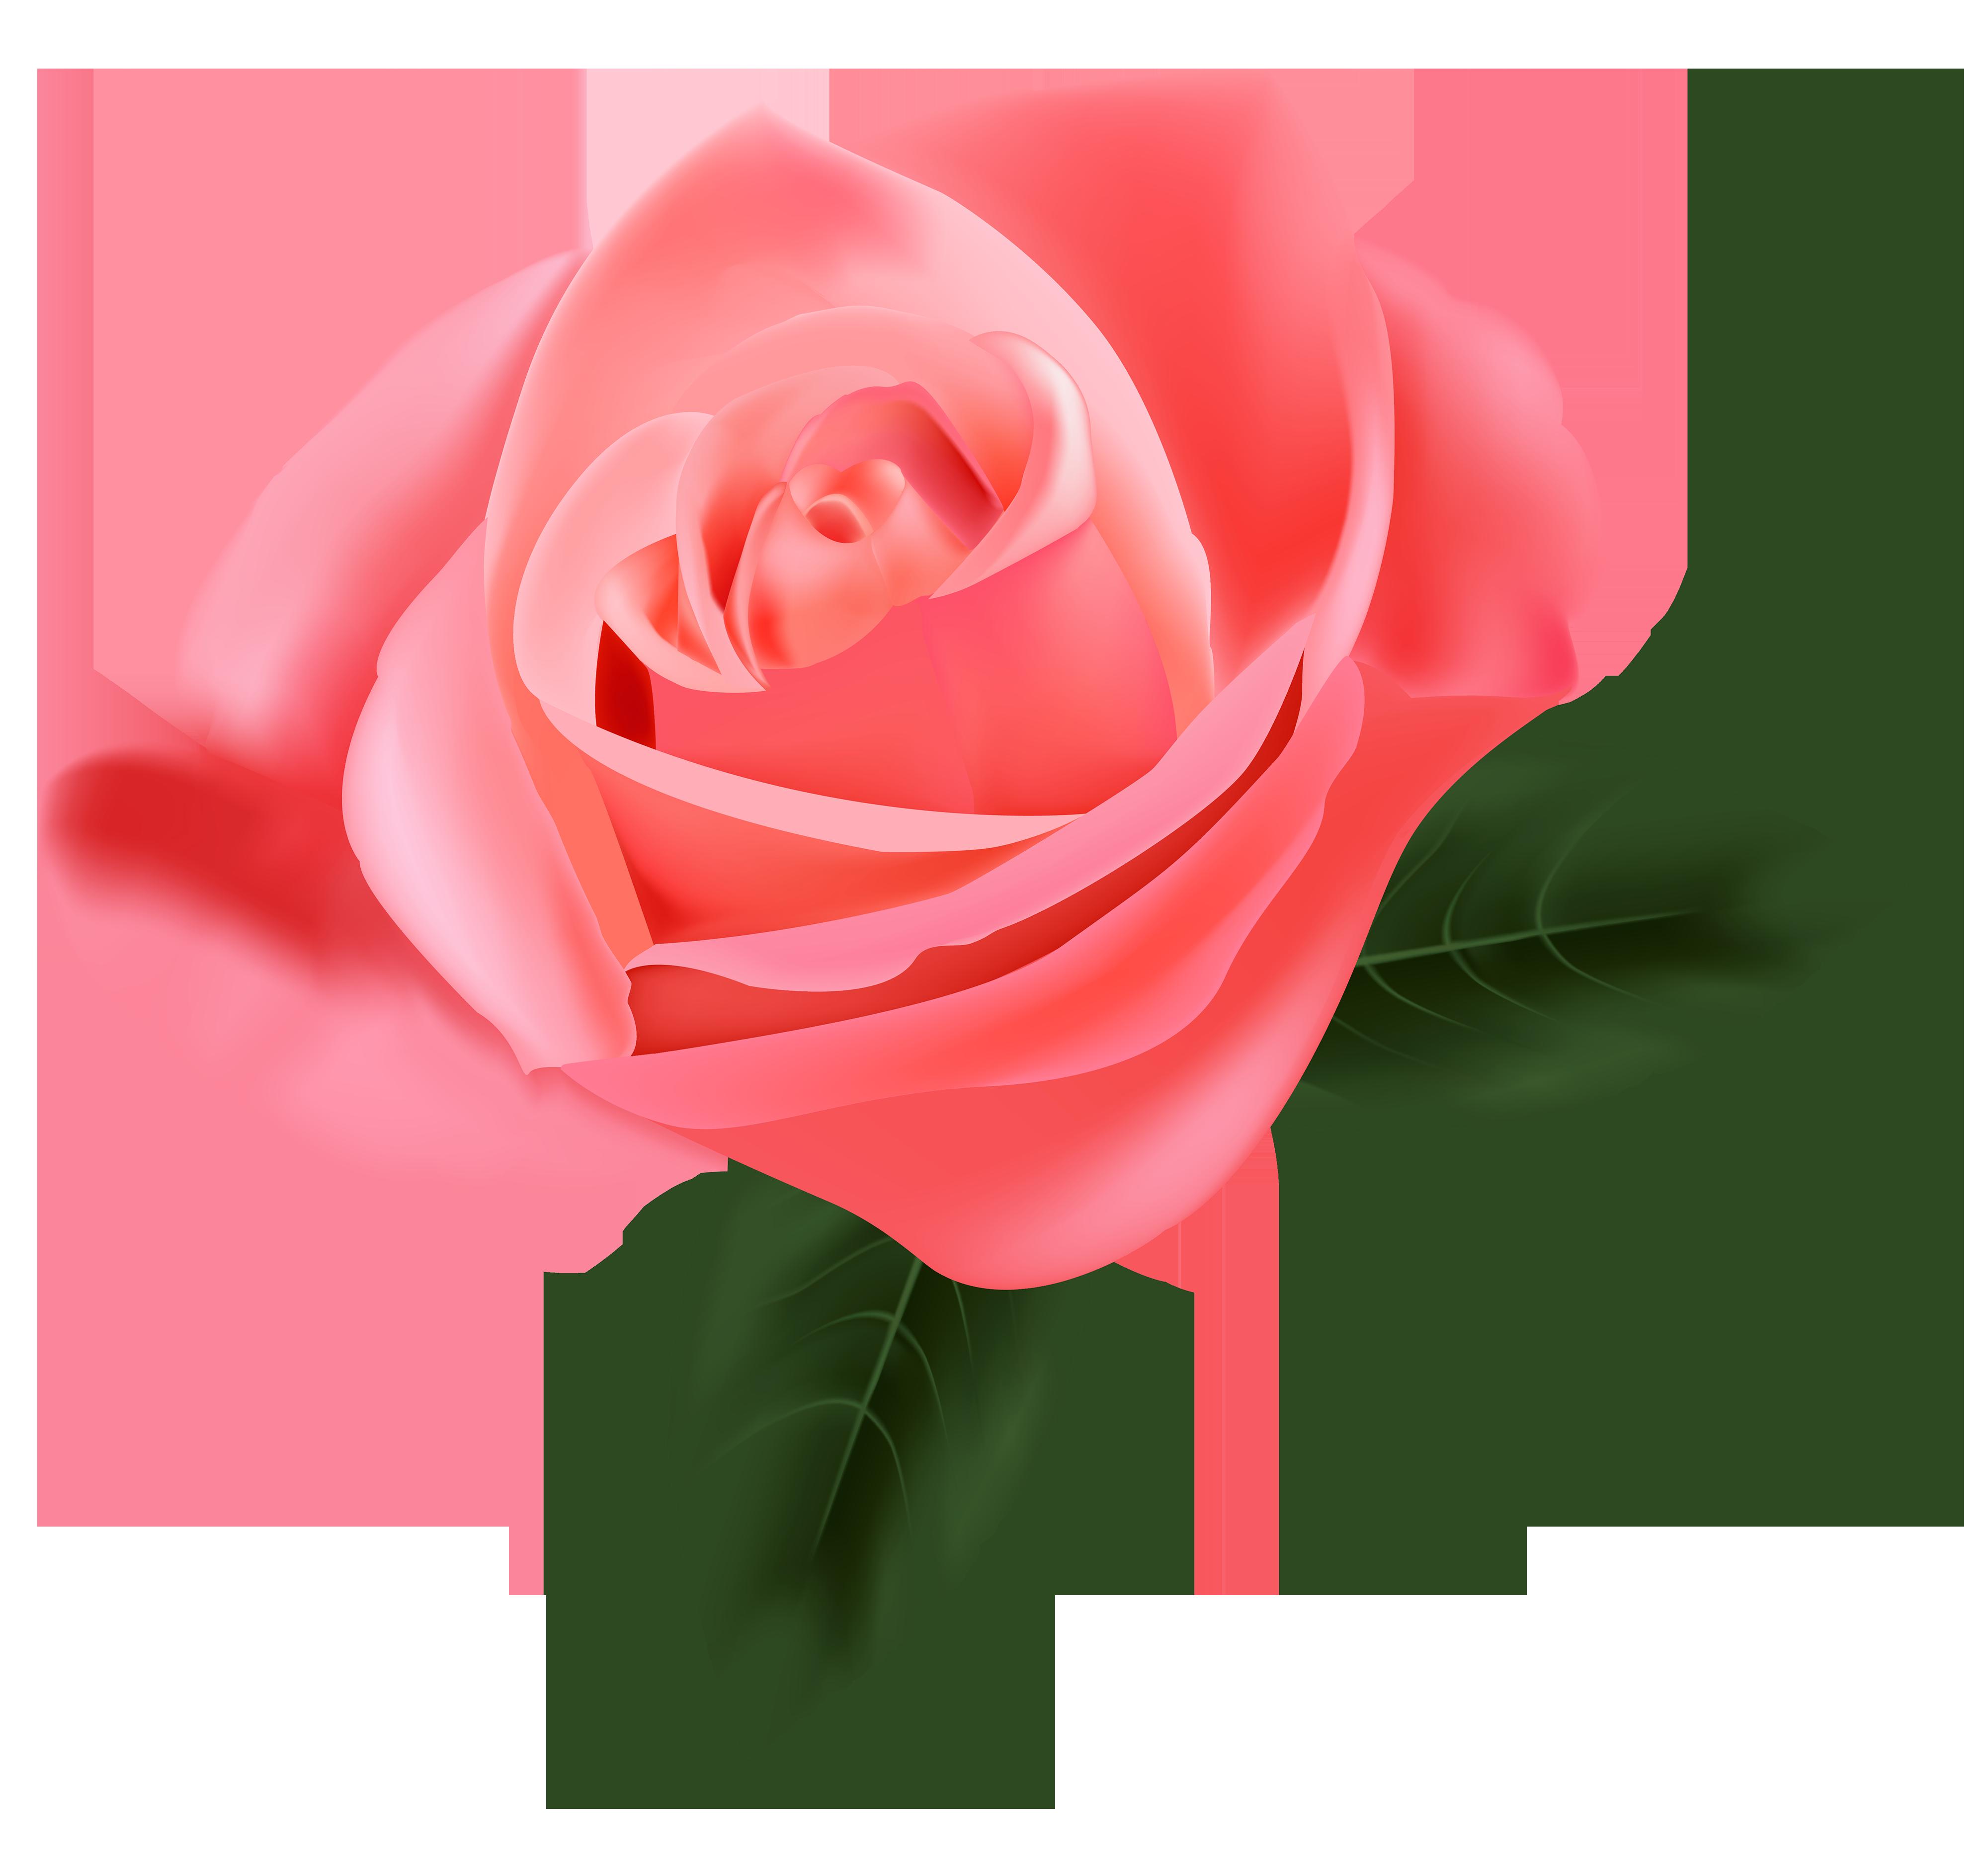 gousicteco: Light Pink Rose Clip Art Images.